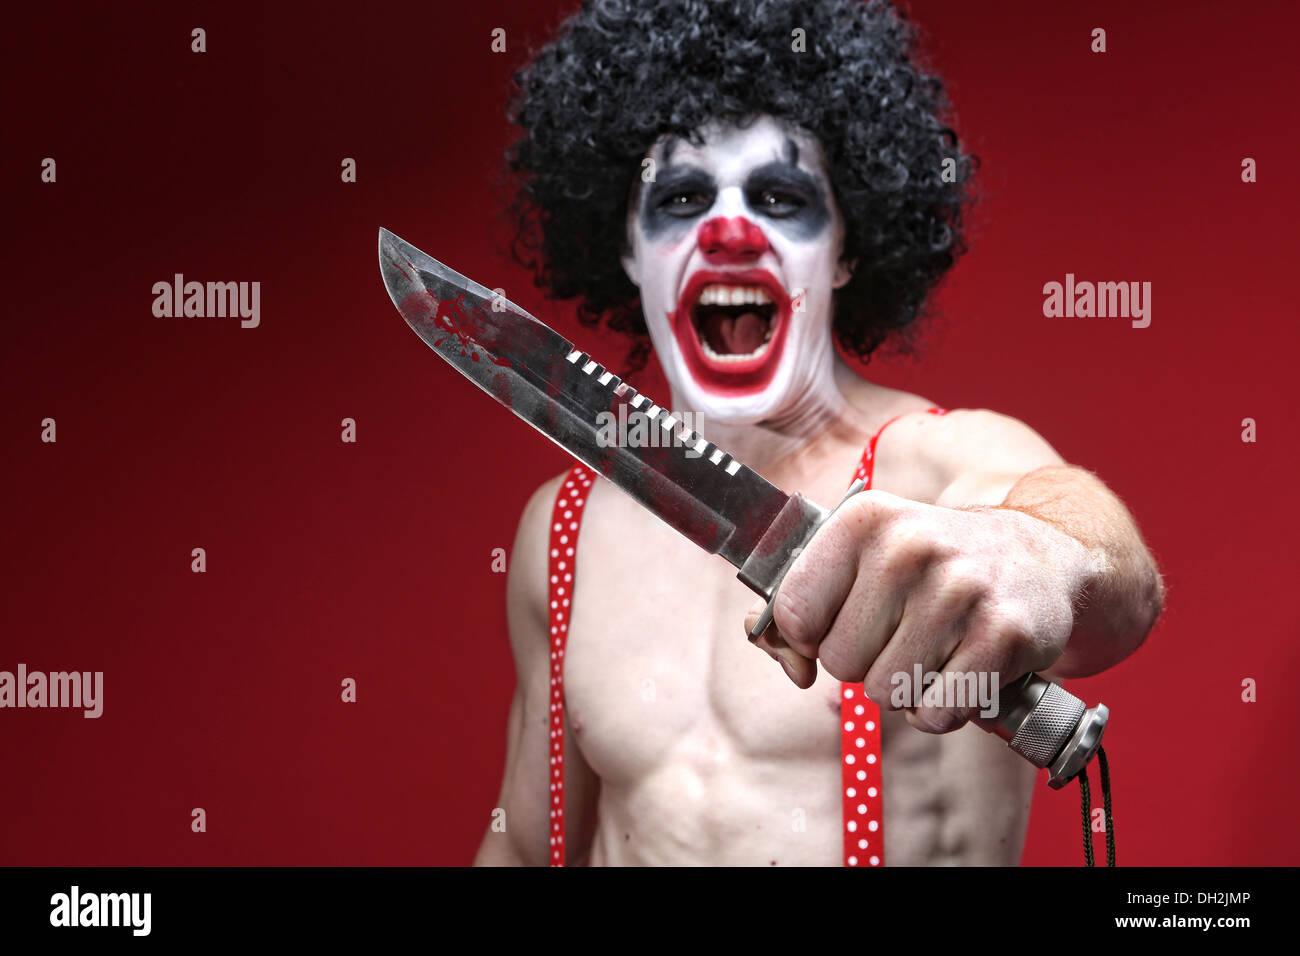 Evil Spooky Clown Portrait Holding Knife - Stock Image